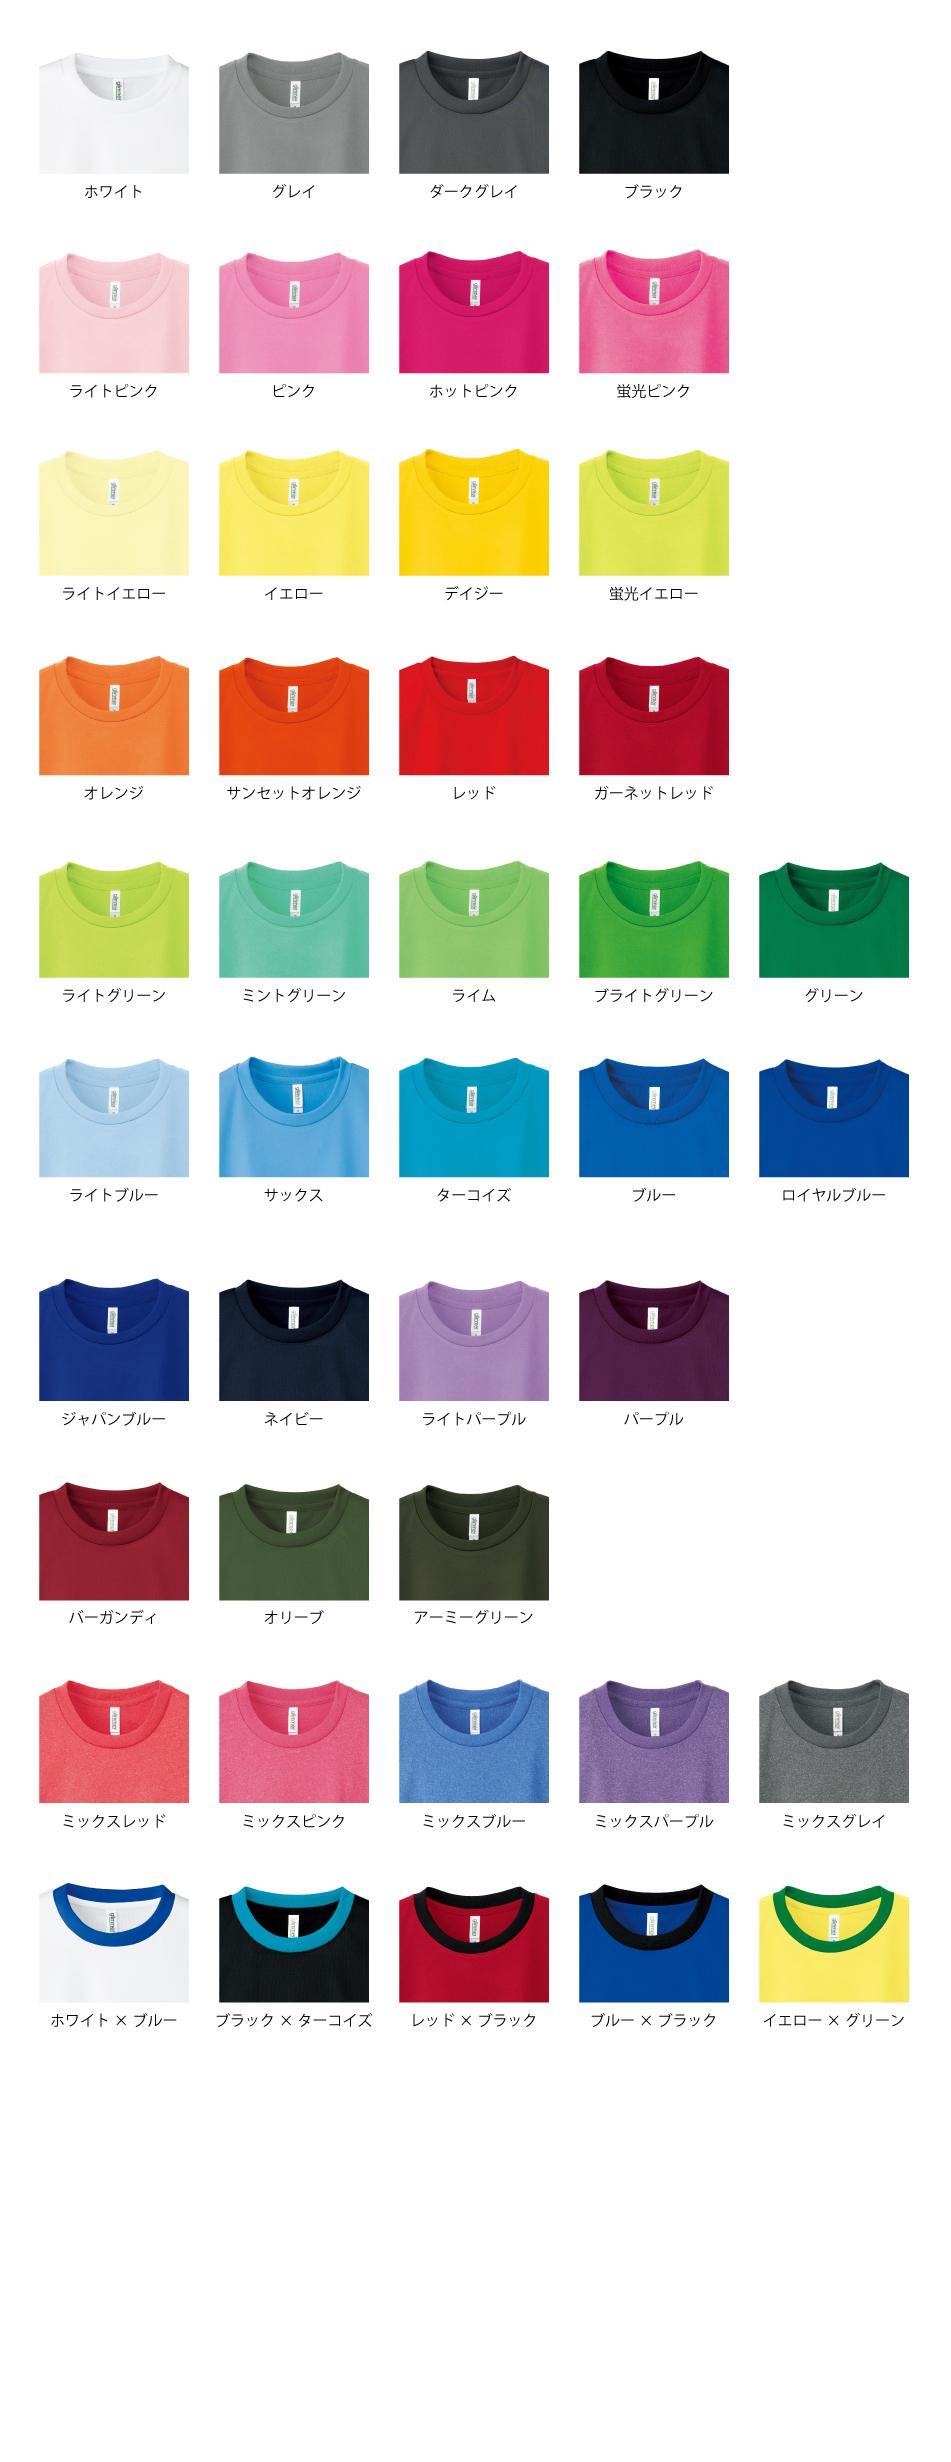 4.4ozドライTシャツ